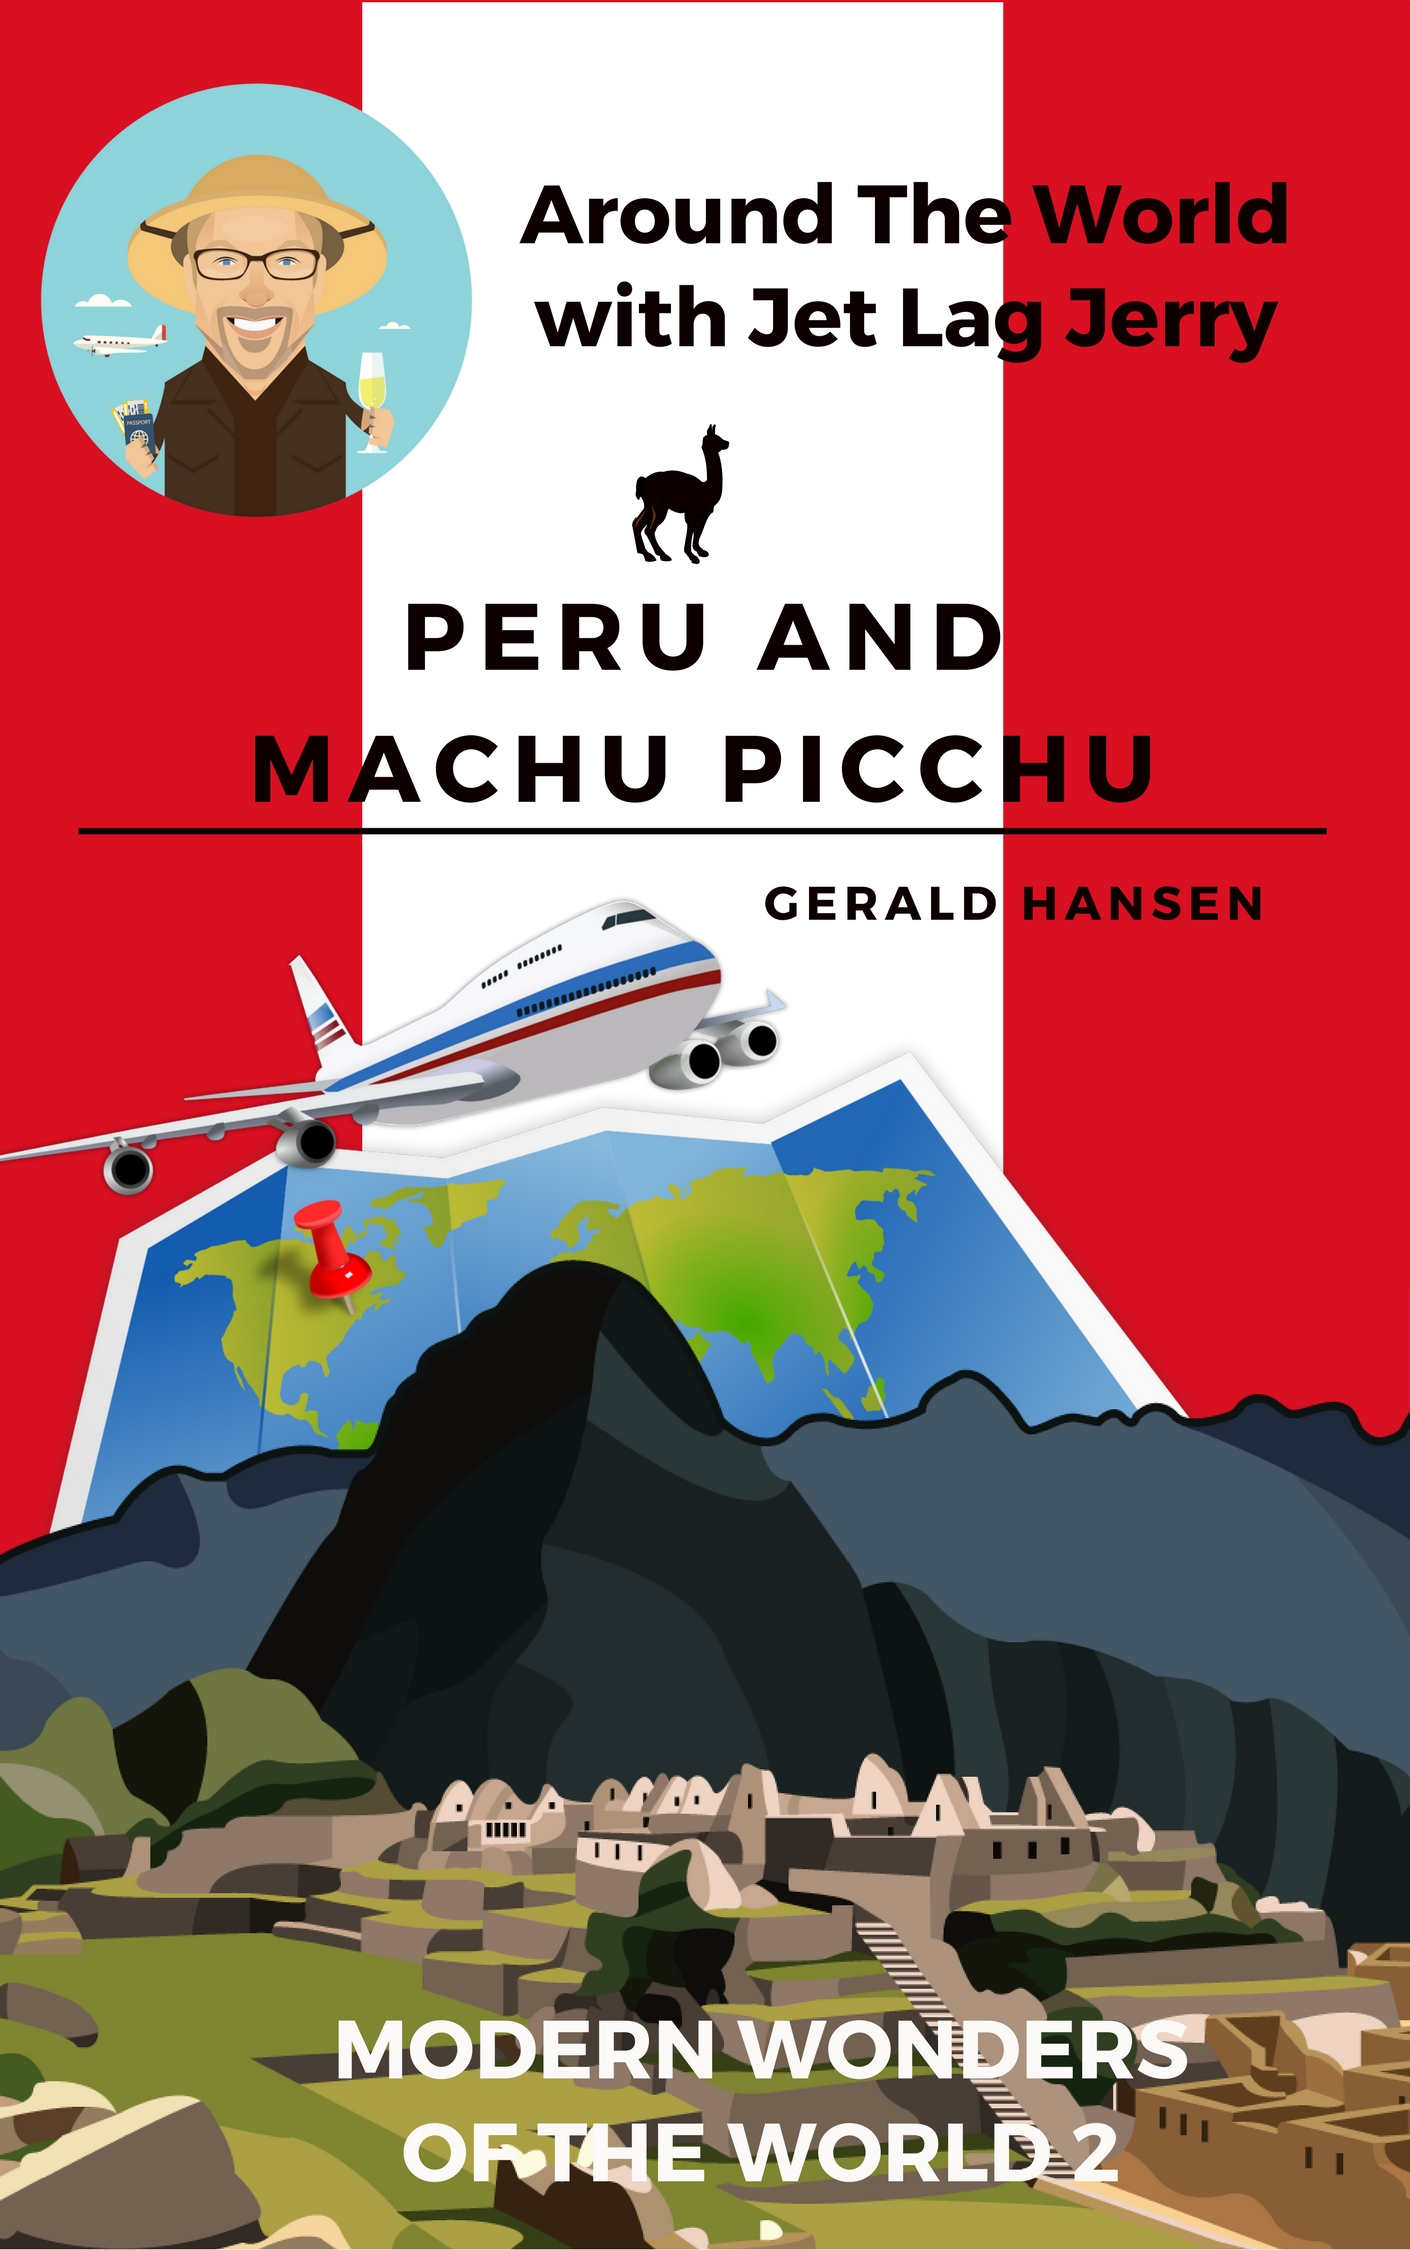 Peru-and-Machu-Picchu-Modern-Wonders-of-